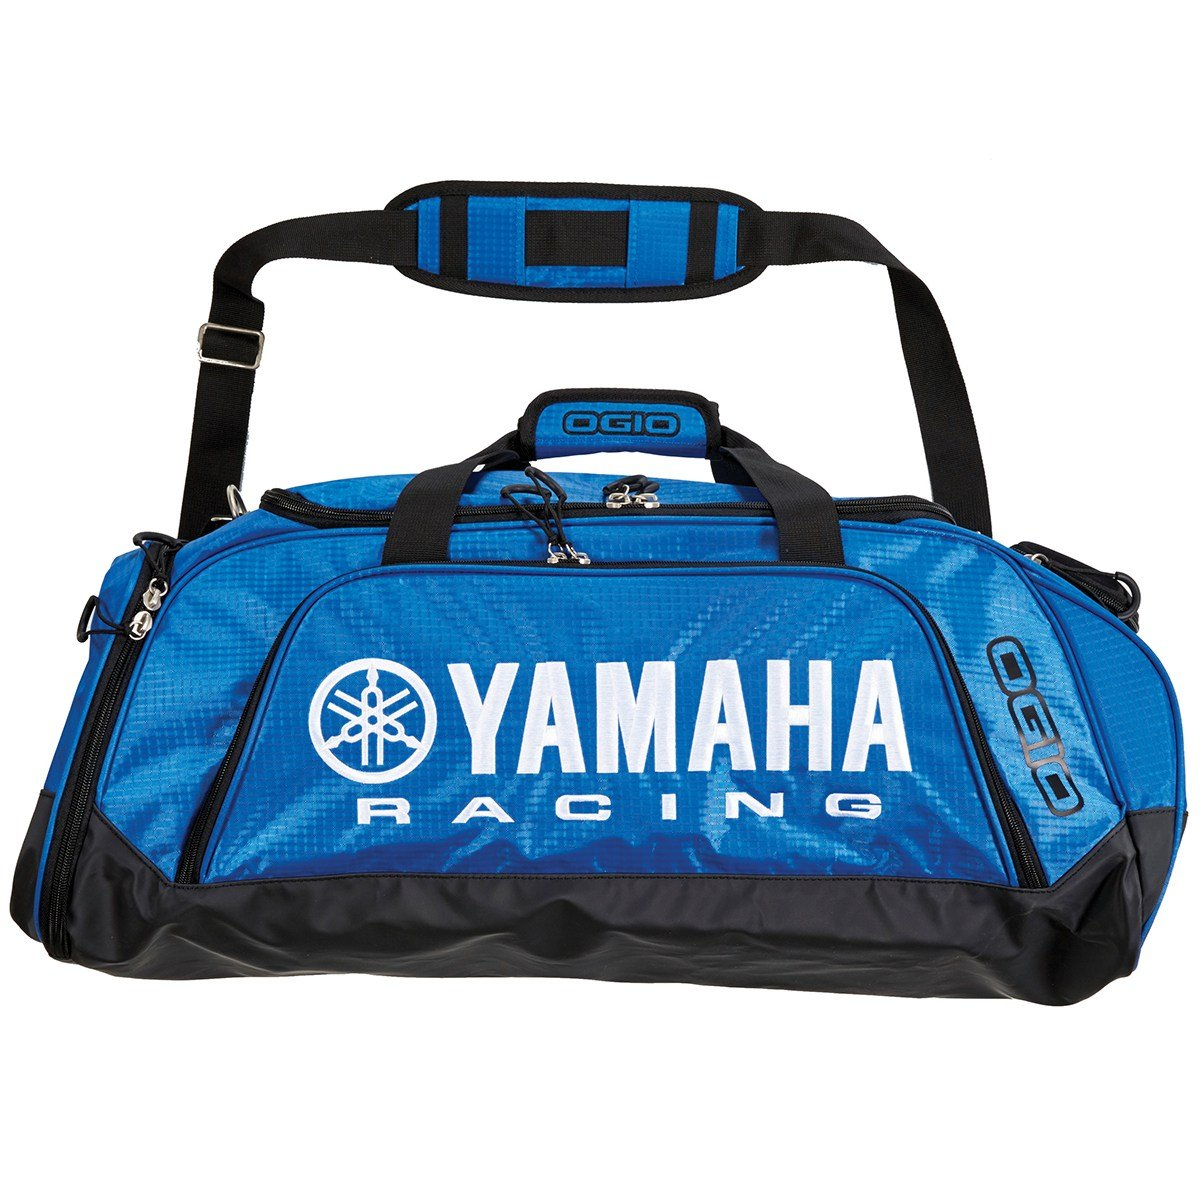 Yamaha Racing Duffle Travel Bag By Ogio - GCR-17DUF-YR-BL